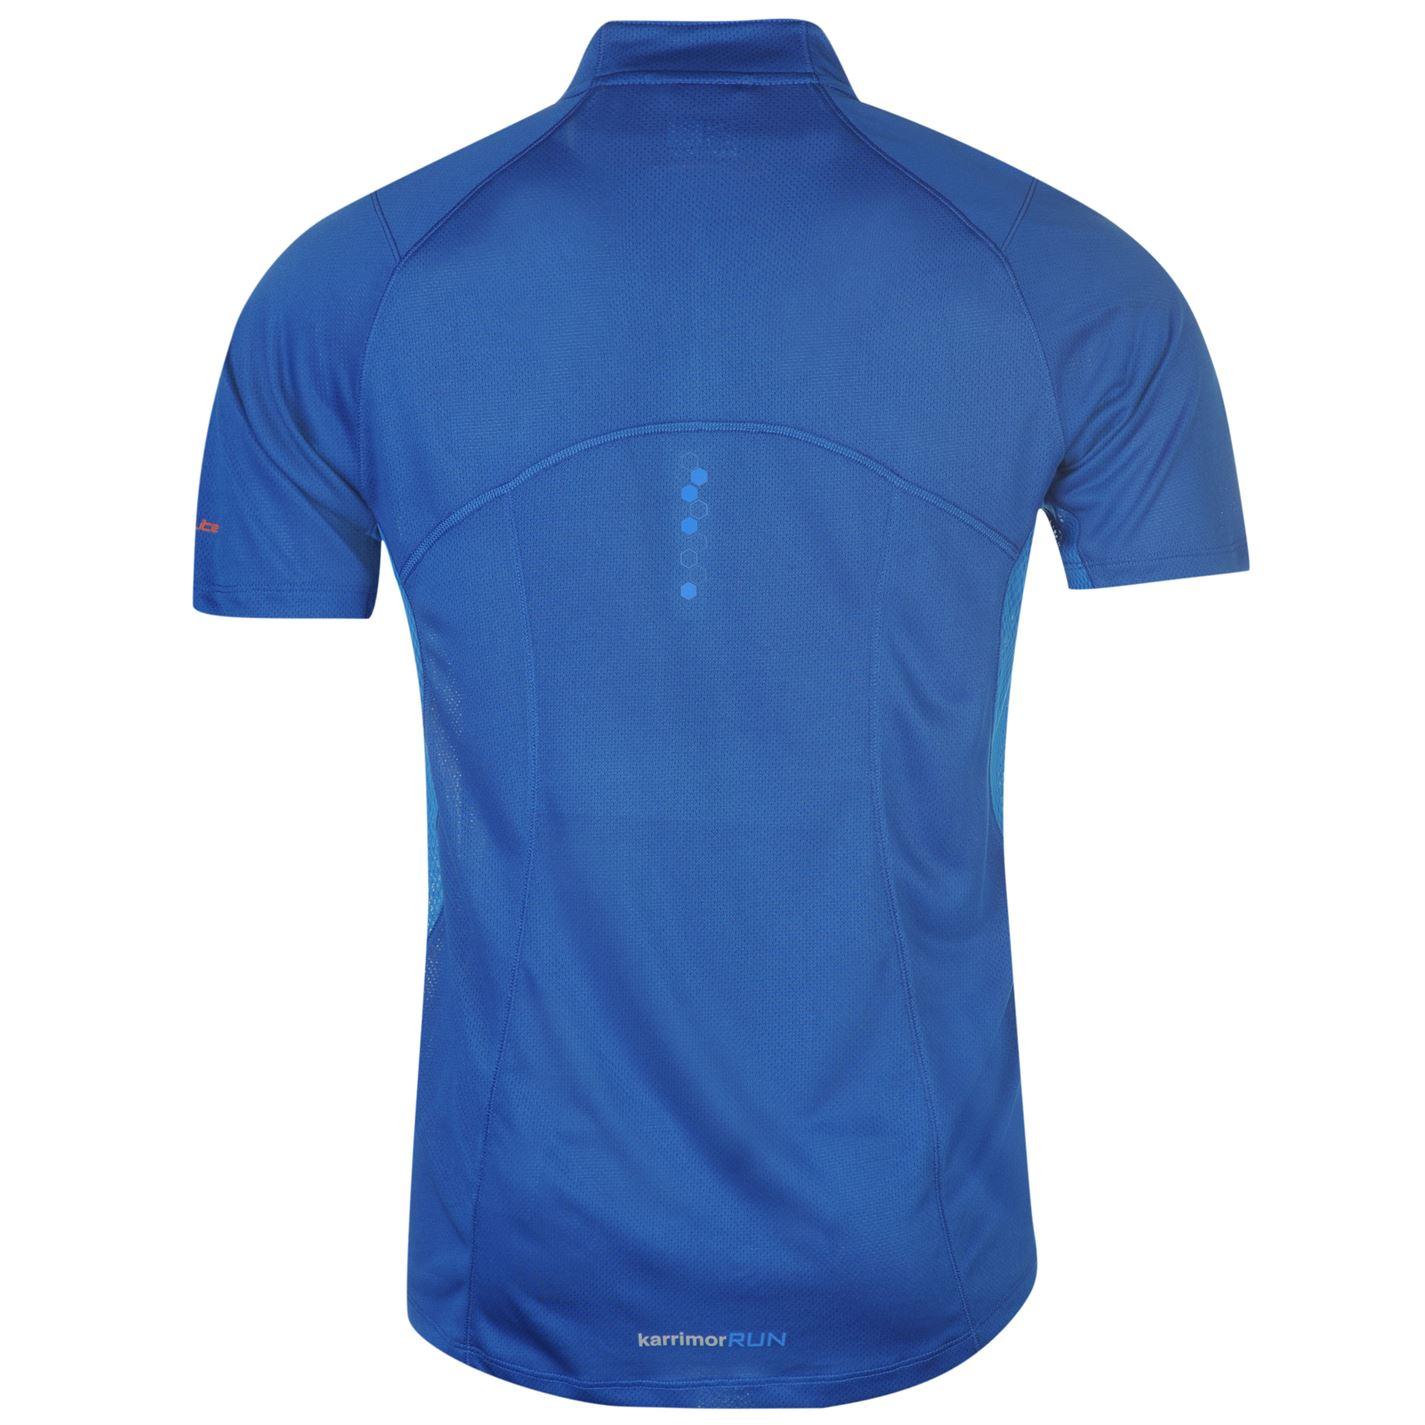 Karrimor-Correr-Mens-X-Cremallera-Camiseta-Camiseta-Top-Transpirable-Ligero-Mentonera miniatura 15